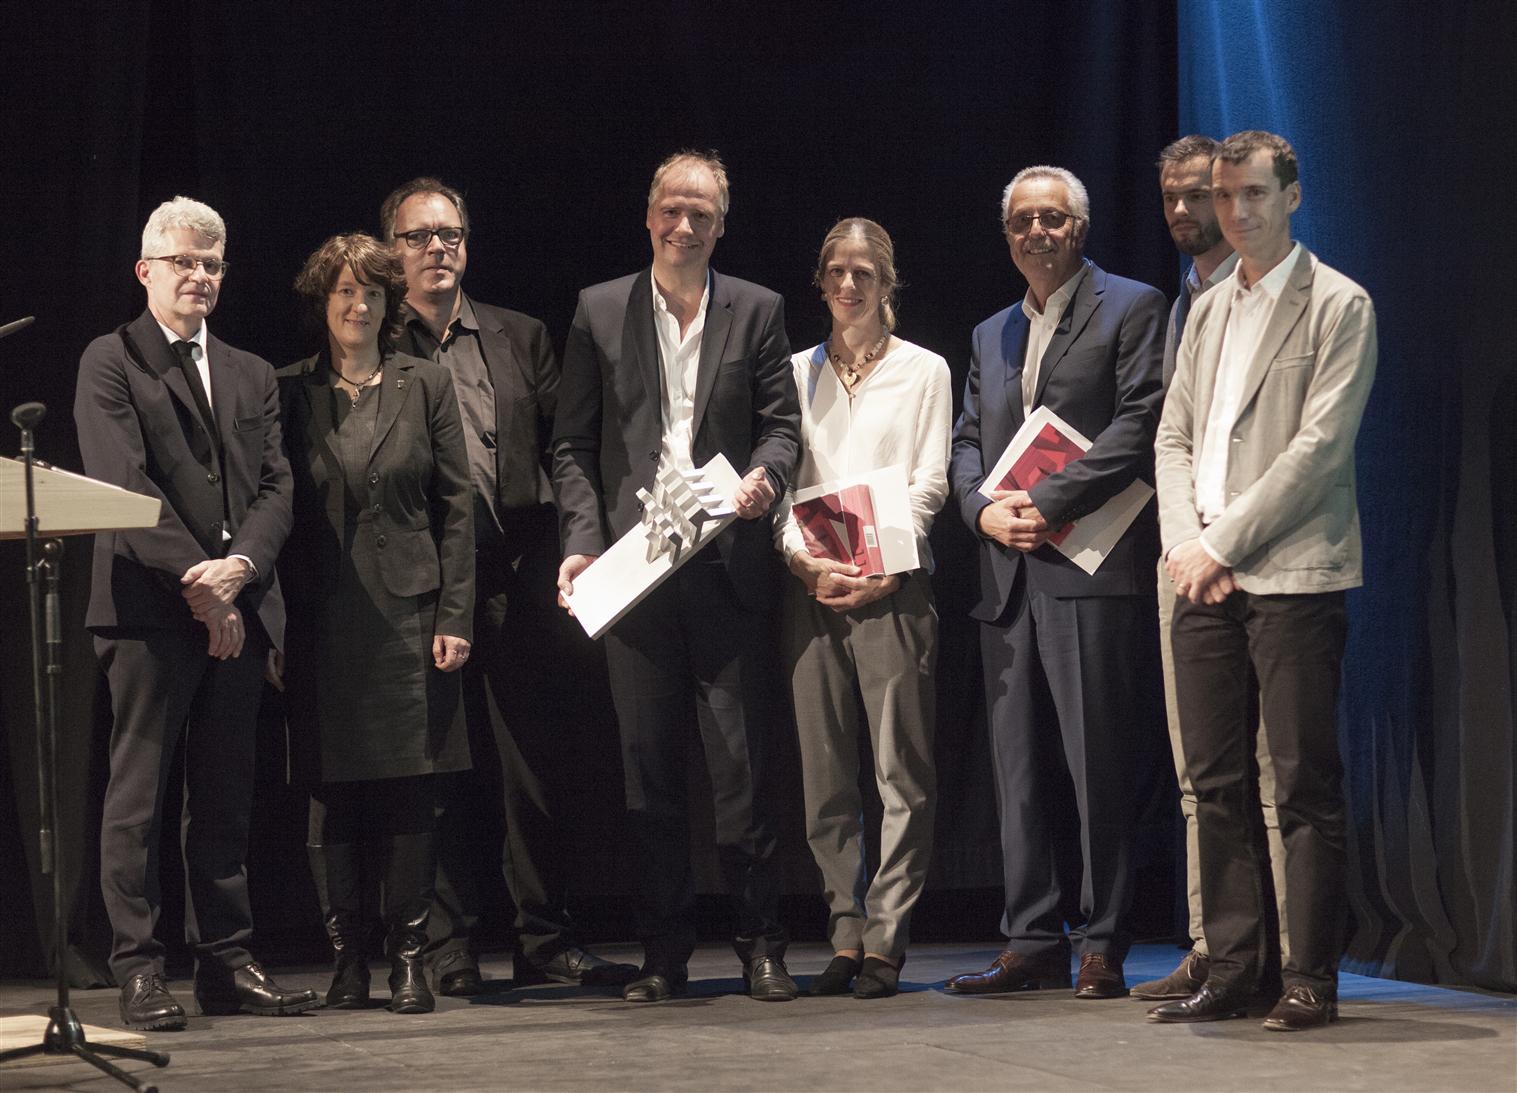 Waechter_Waechter_Theater Heidelberg_2015_Hugo-Häring_Landespreis 2015